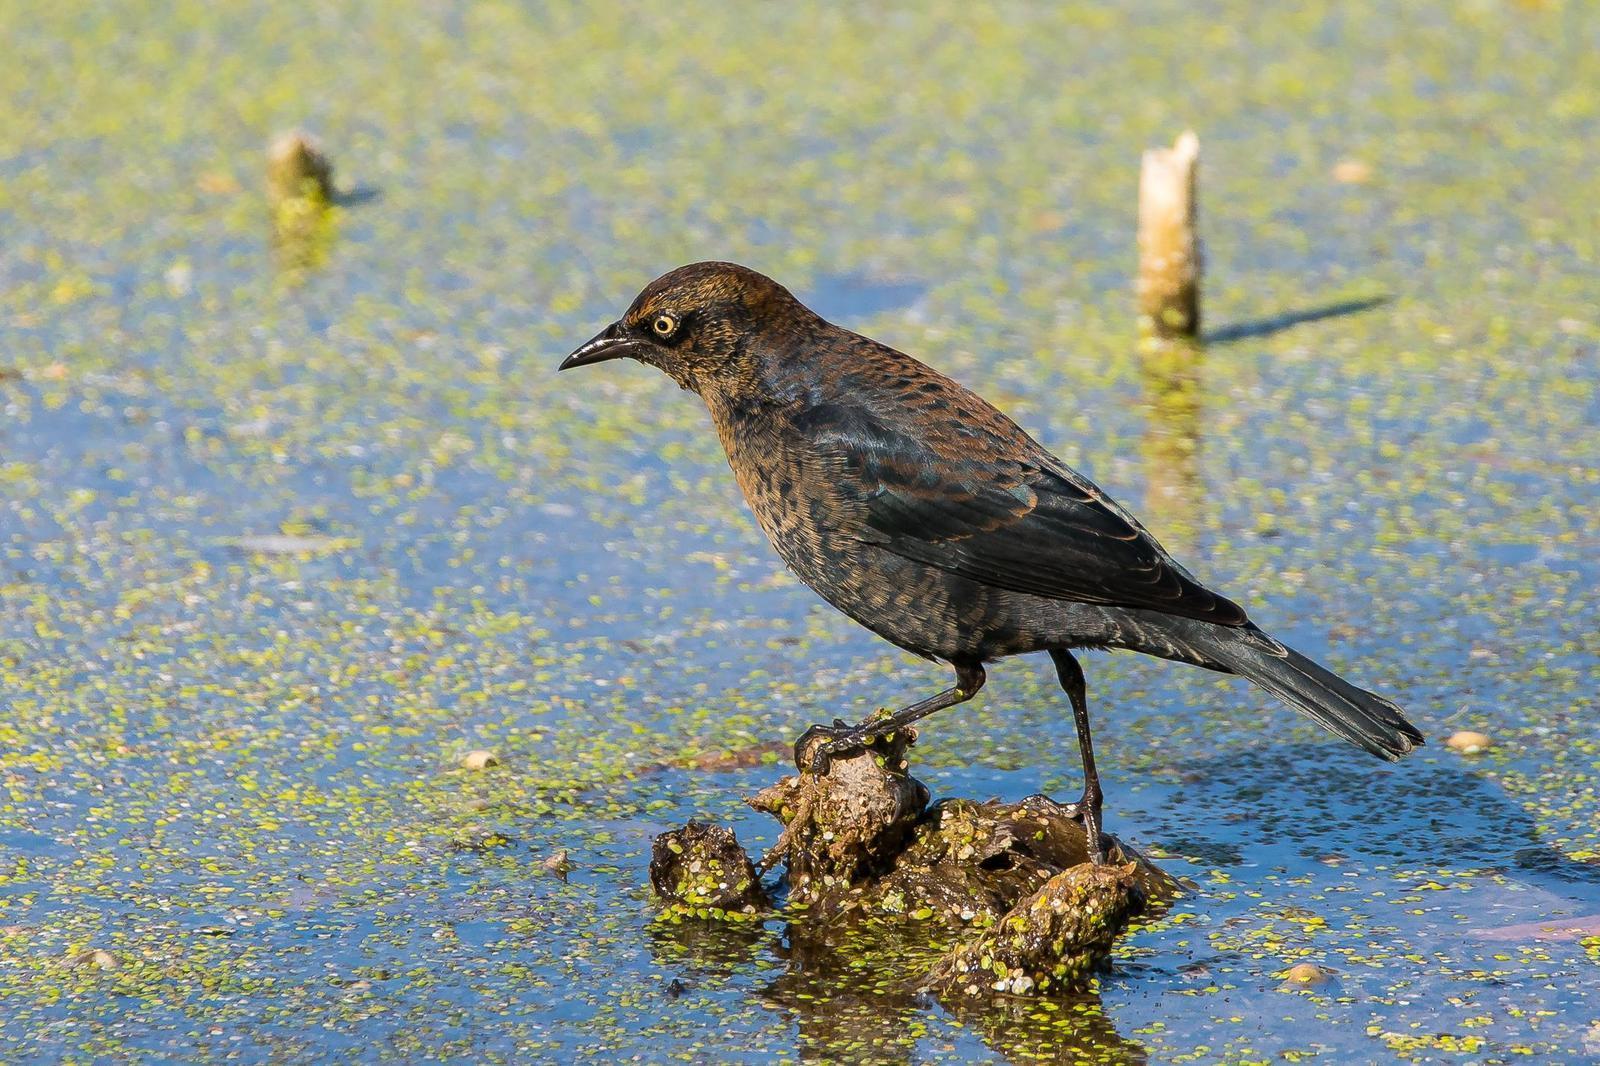 Rusty Blackbird Photo by Gerald Hoekstra